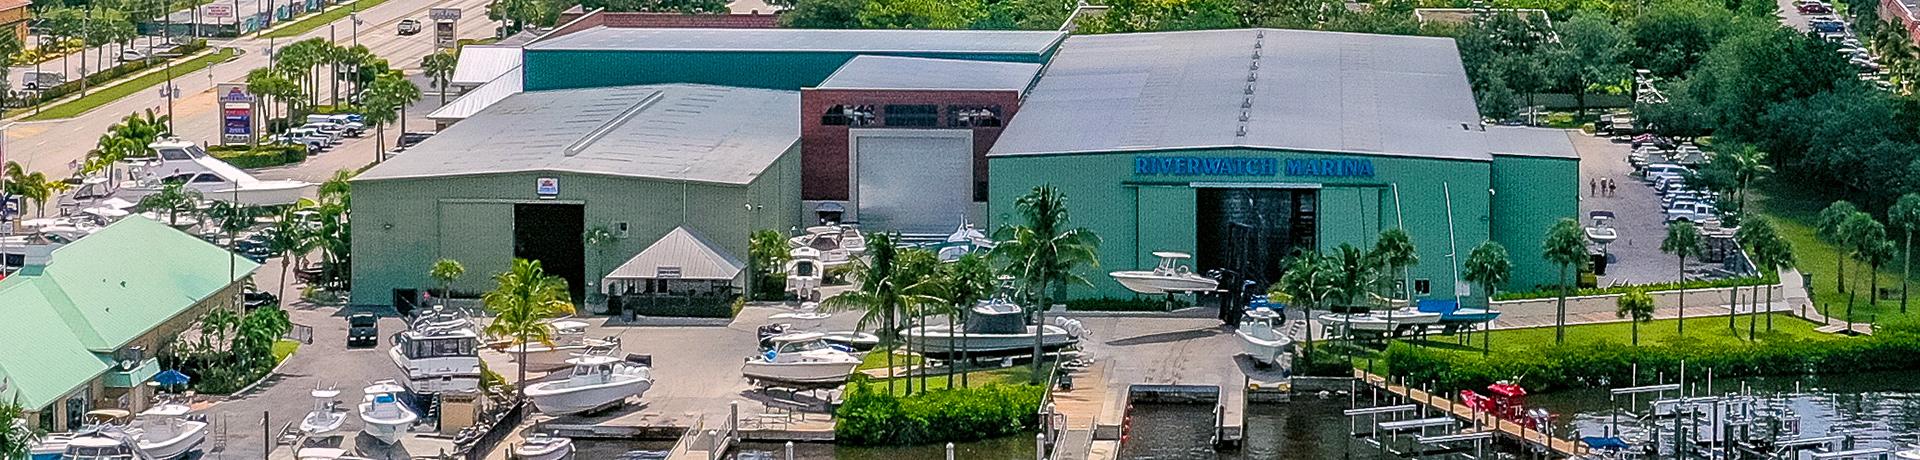 Riverwatch Marina Aerial View